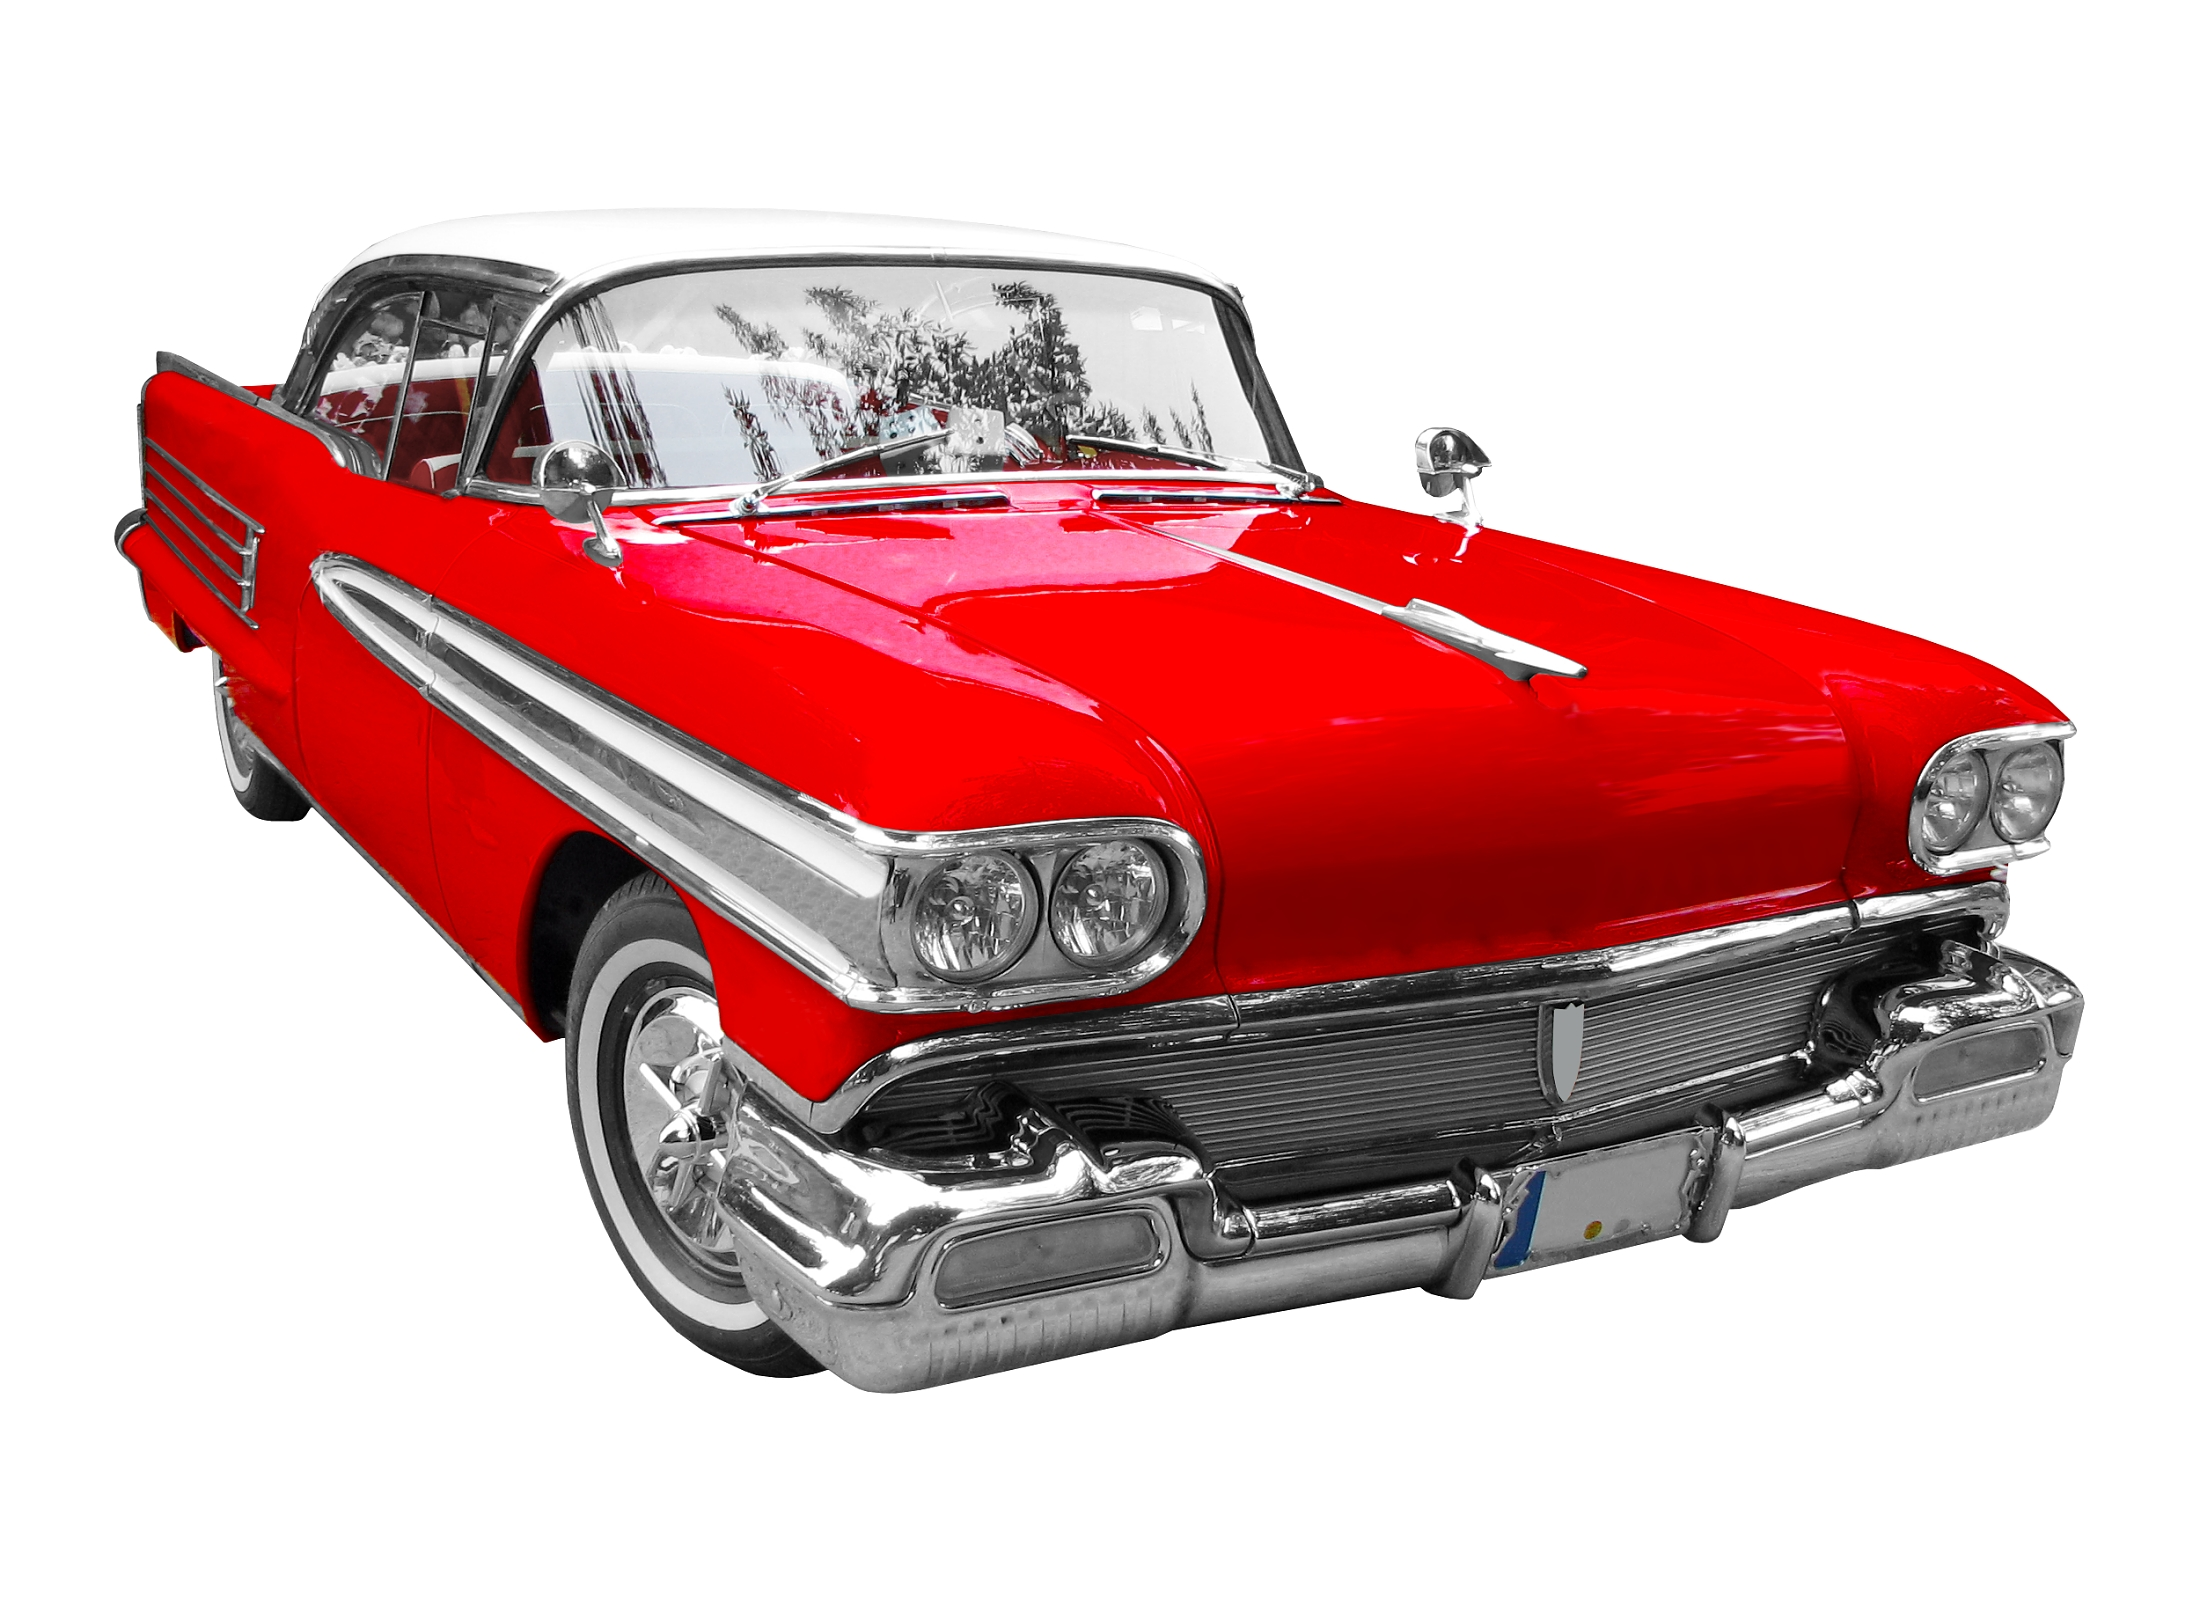 Old Vintage Cars. Interesting Old Classic Cars Antique Vintage Cars ...